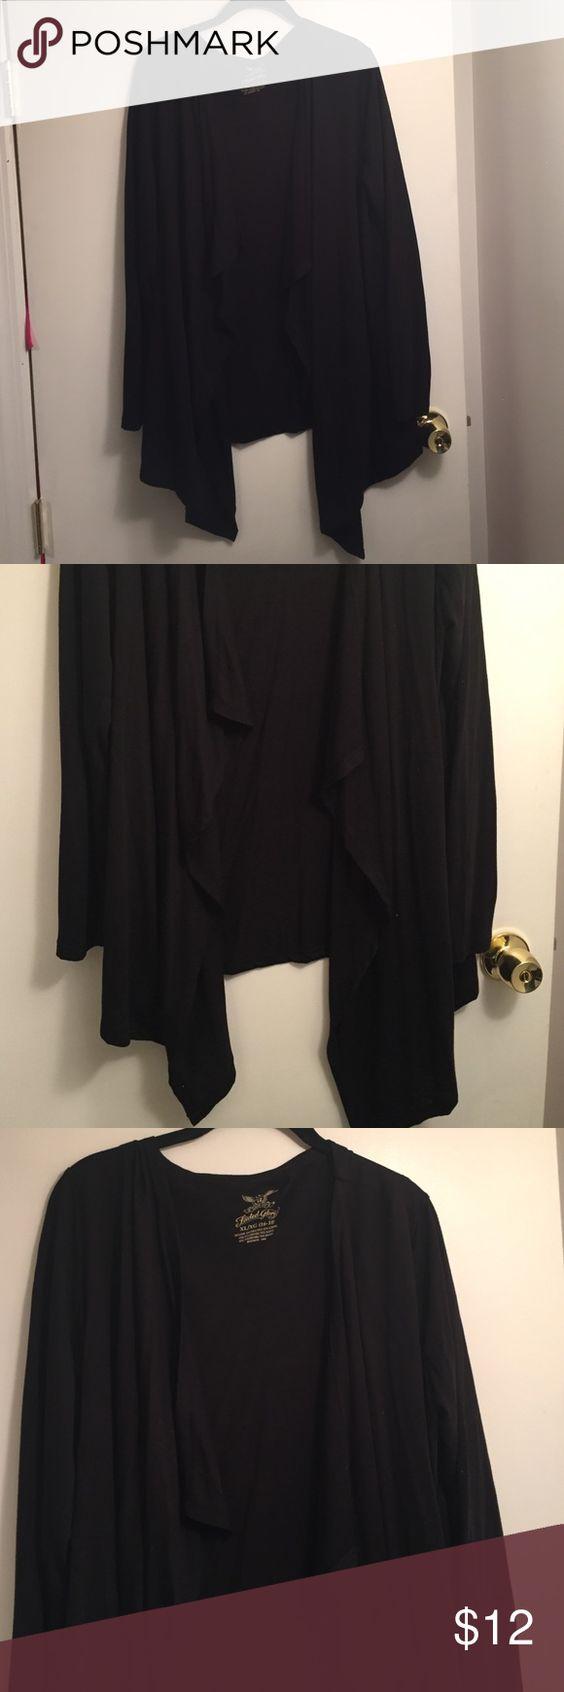 Black Cover Up Loose Fitting Black Shrug Tops